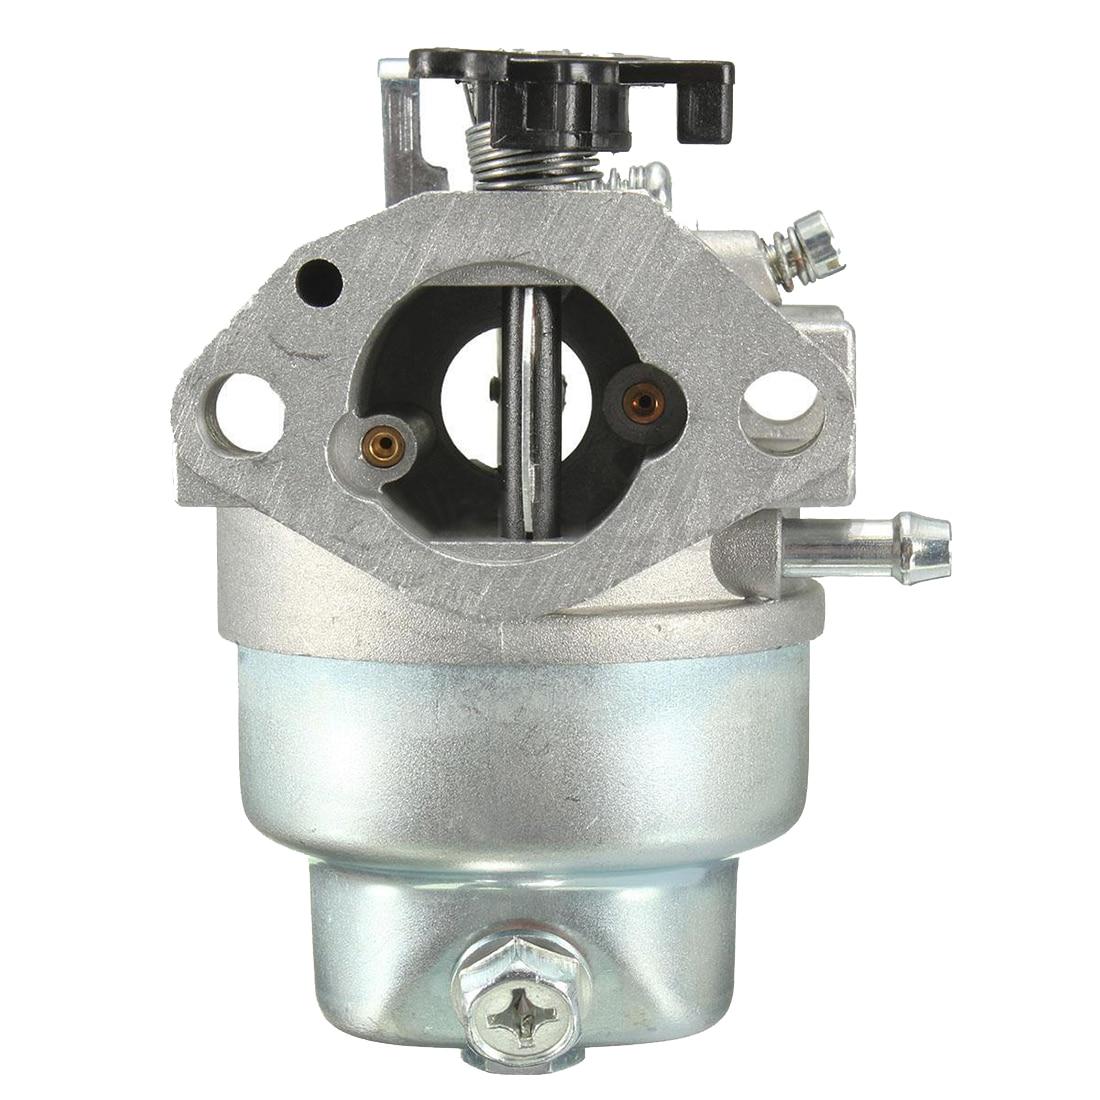 AUTO Adjustable Carburetor Carb For HONDA GCV160 HRB216 HRS216 HRR216 HRT216 Engine Silver